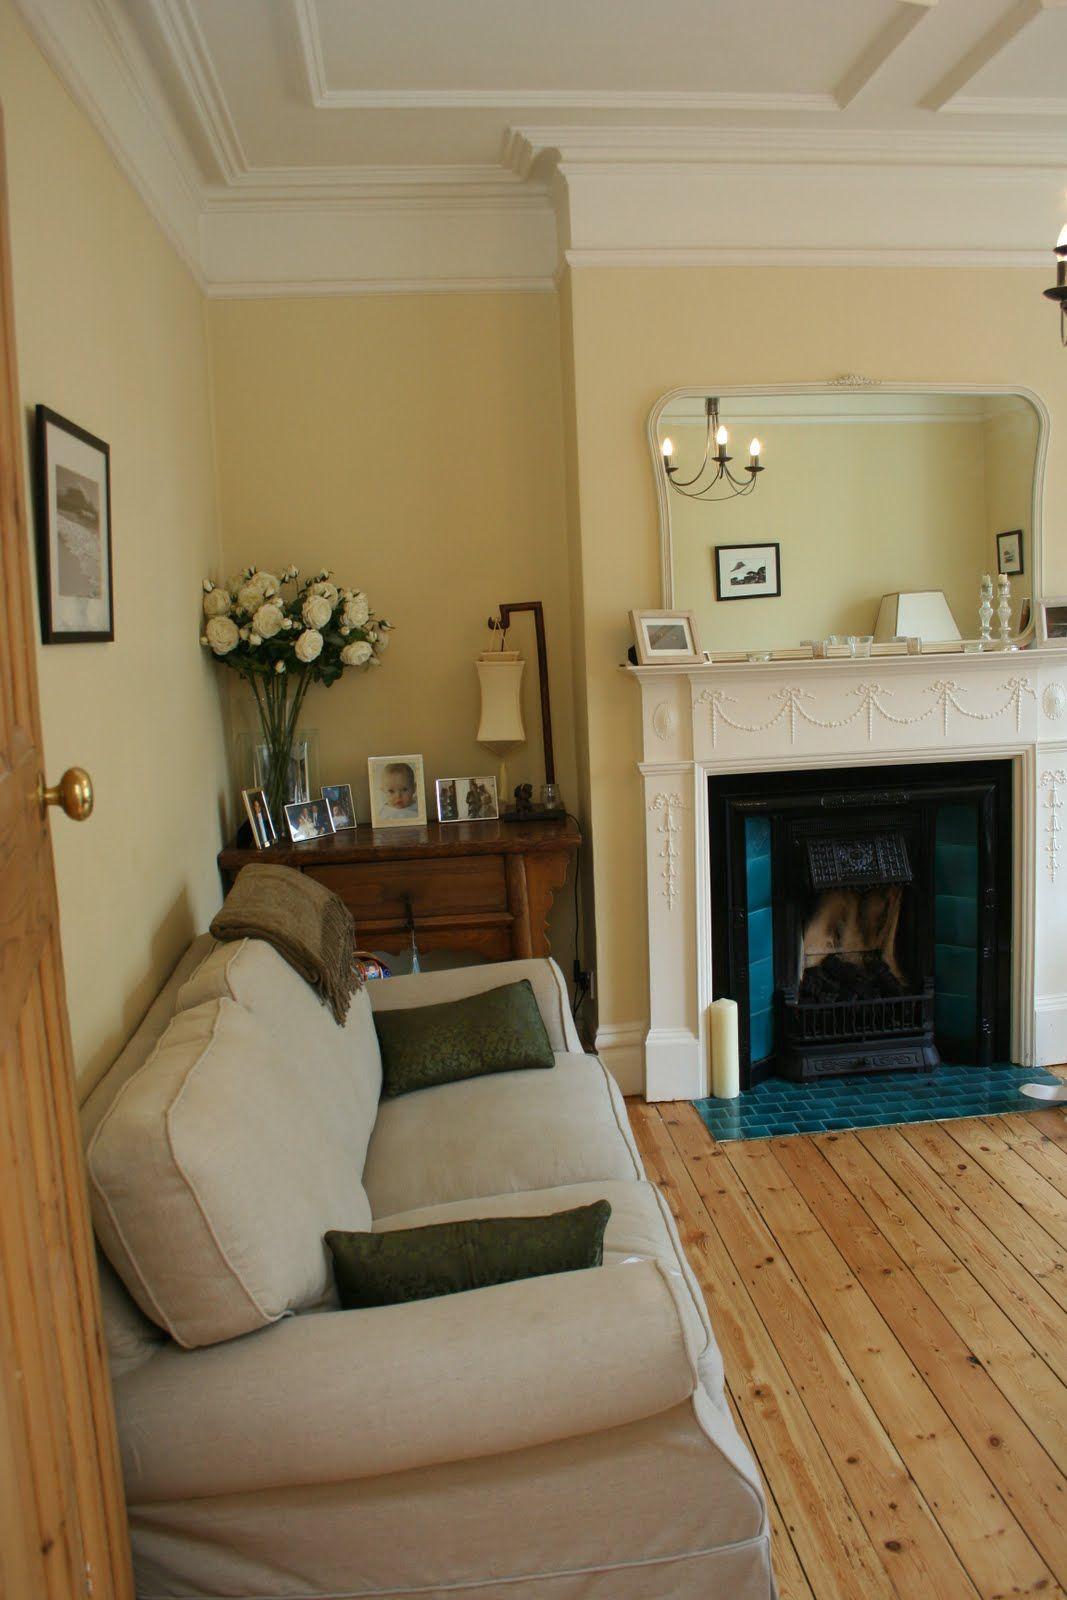 Move door to sitting room? | Color | Pinterest | Mos def, Doors and Room